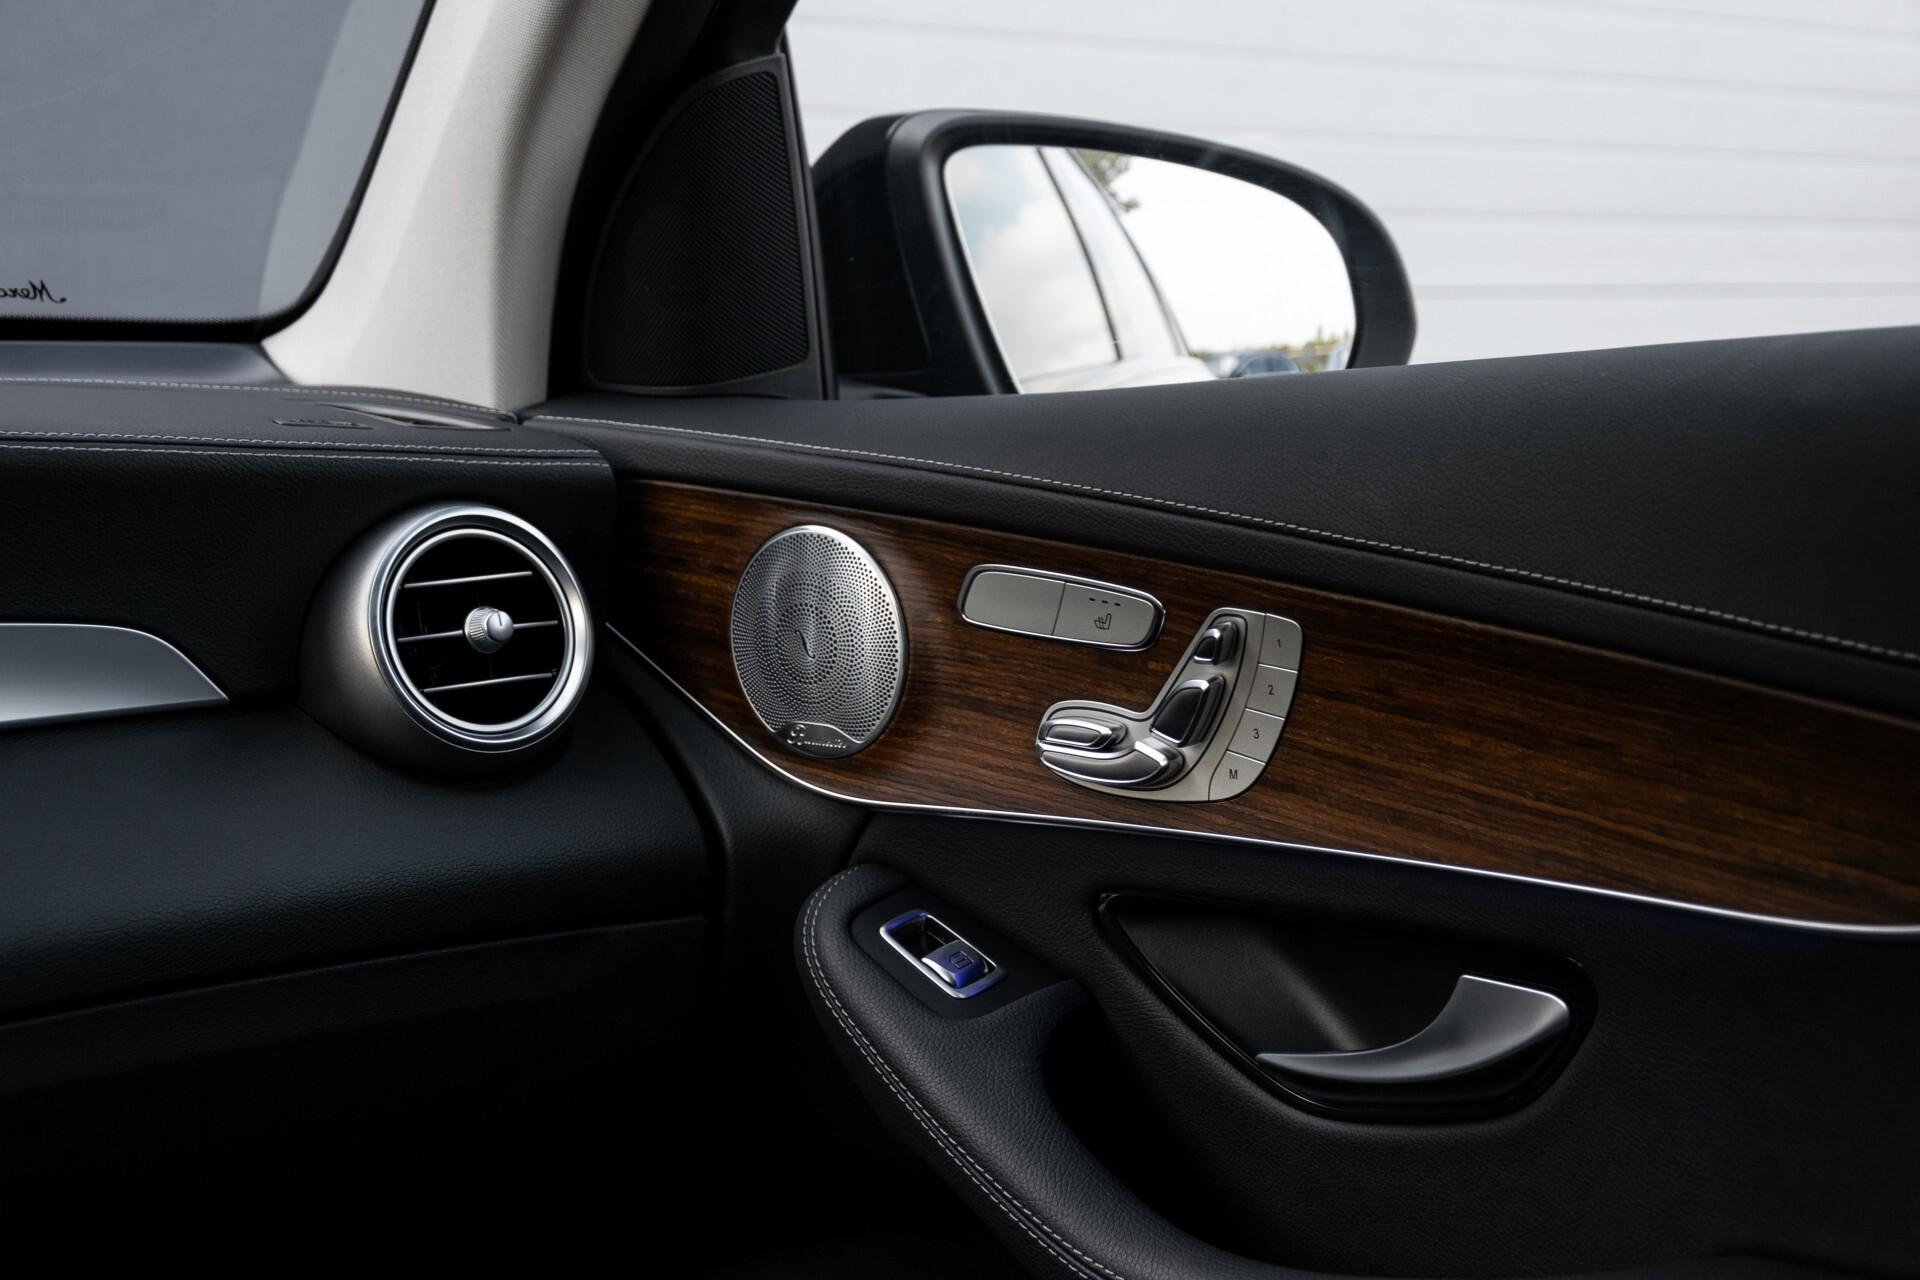 Mercedes-Benz GLC 300e 4-M Luchtvering/Panorama/Multicontourstoelen/Rij-assistentie/Standkachel Aut9 Foto 51